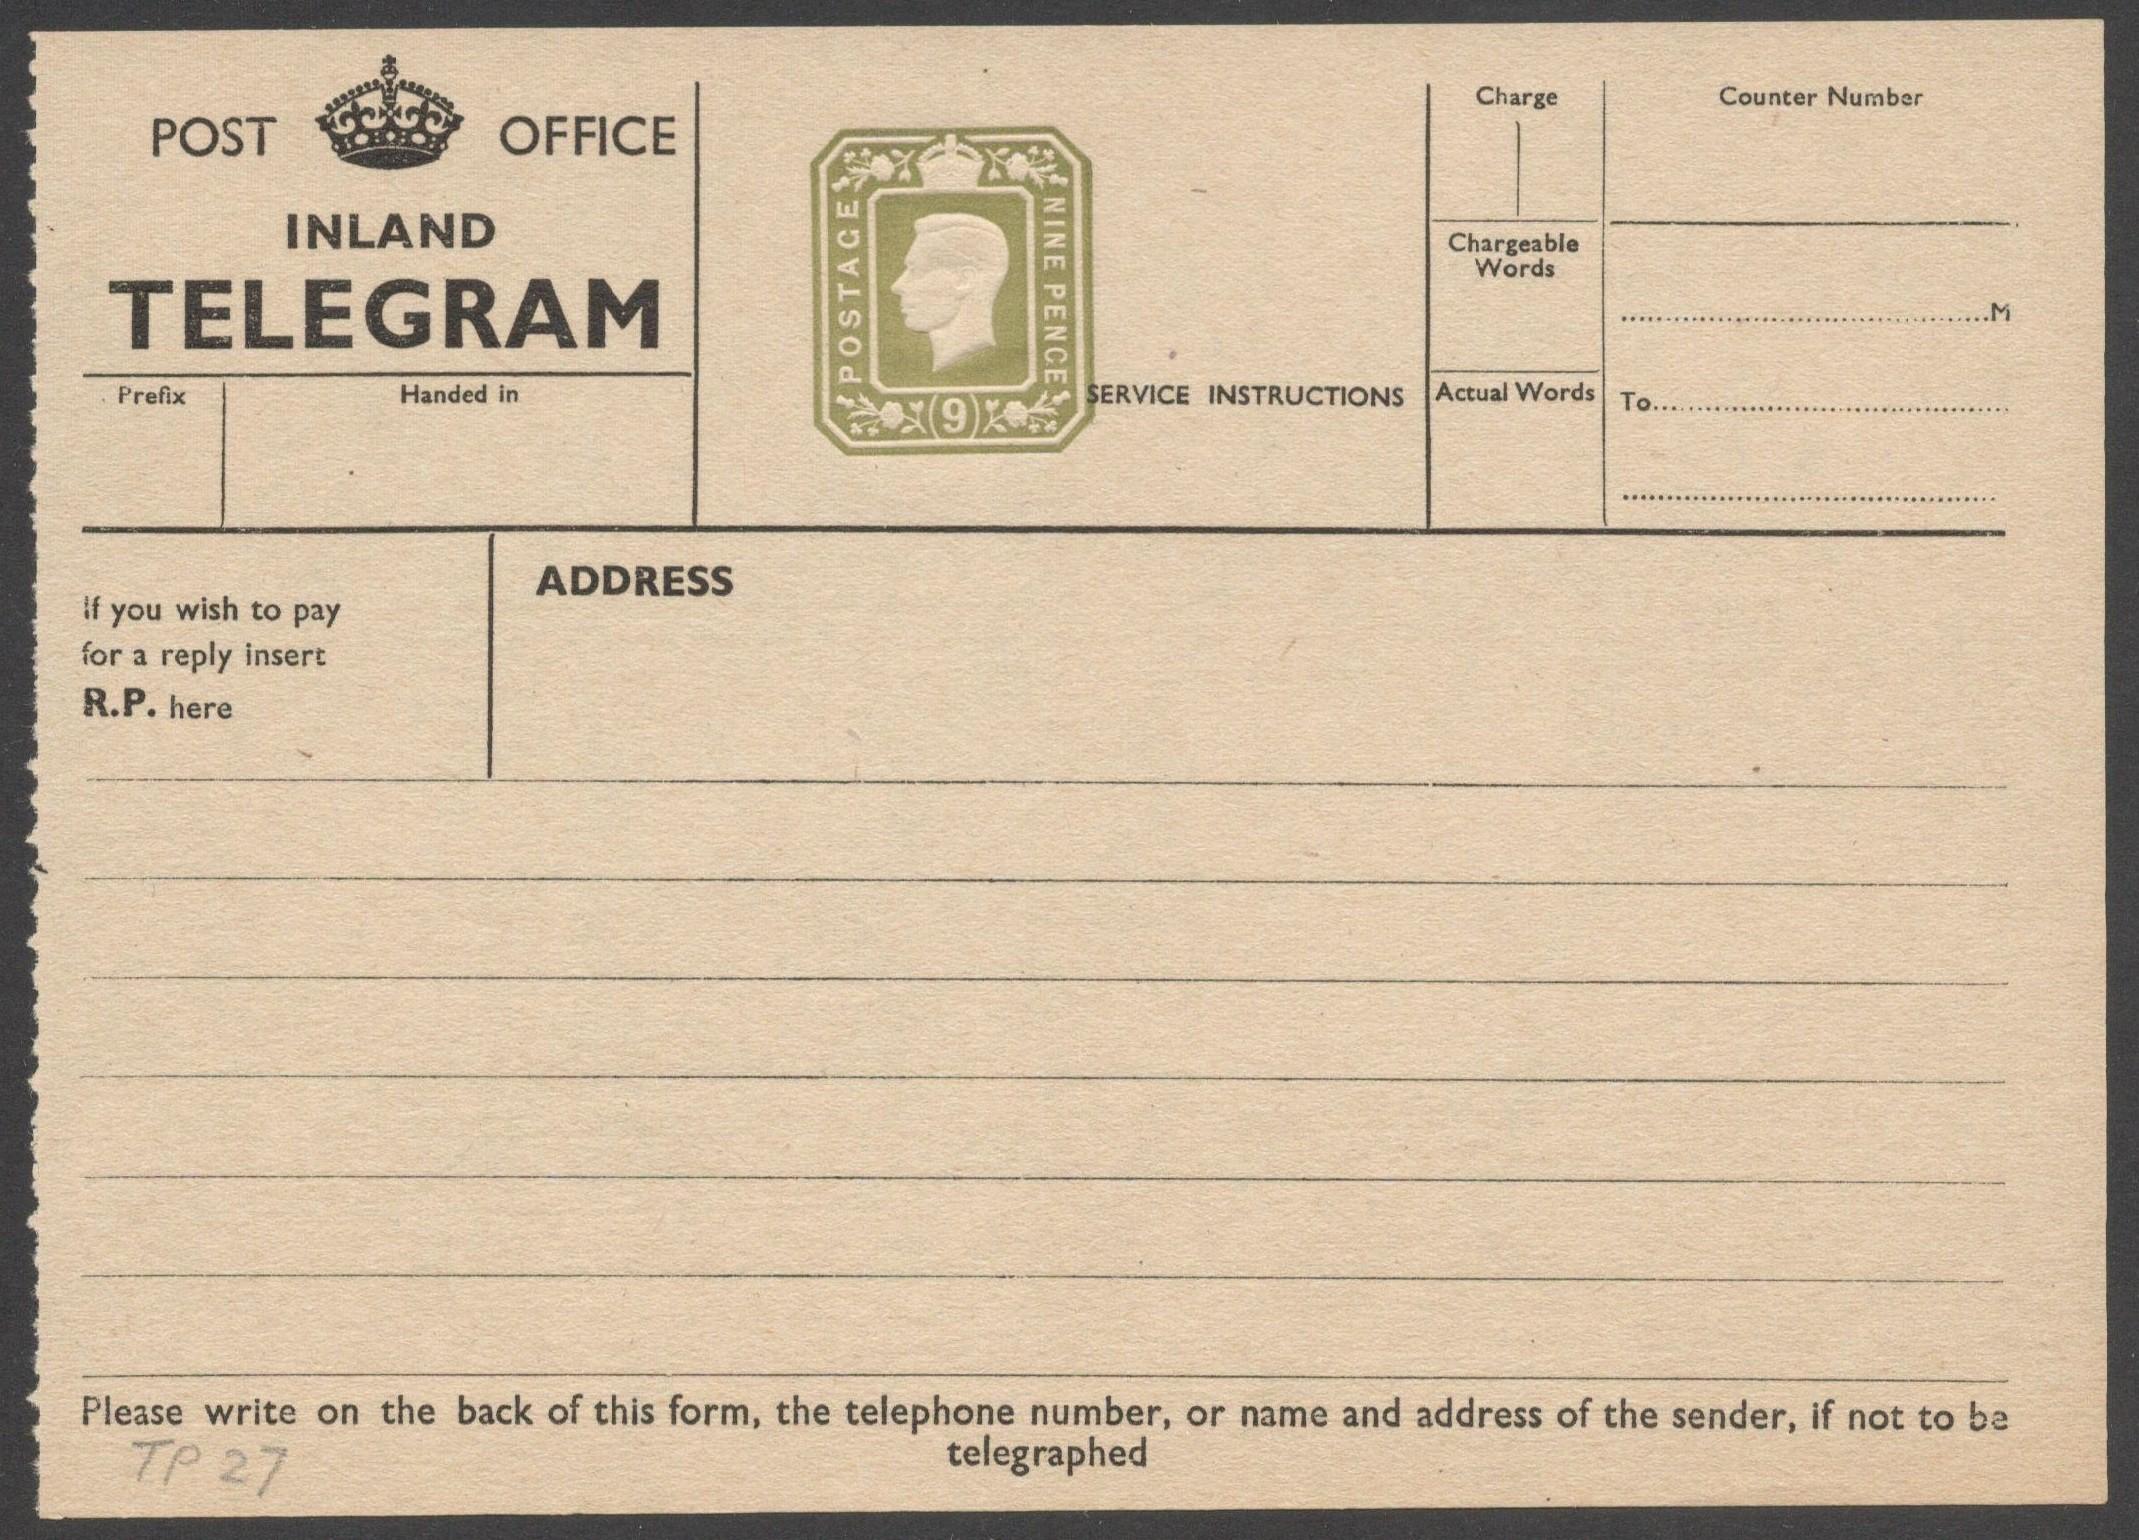 Lot 23 - POST OFFICE INLAND TELEGRAM 1940 KGVI TELEGRAPH FORM 9 PENCE